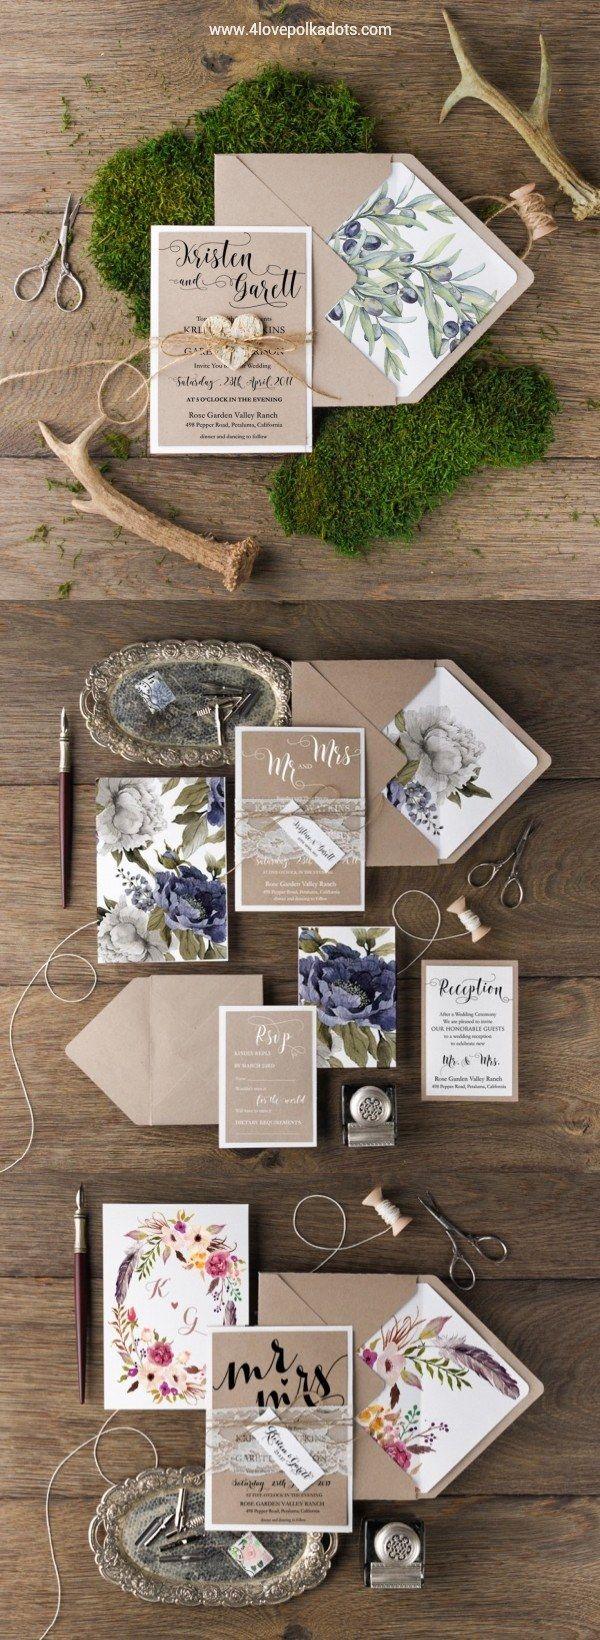 bed bath and beyond wedding invitation kits%0A Rustic kraft paper wedding invitations  rusticweddinginvitations